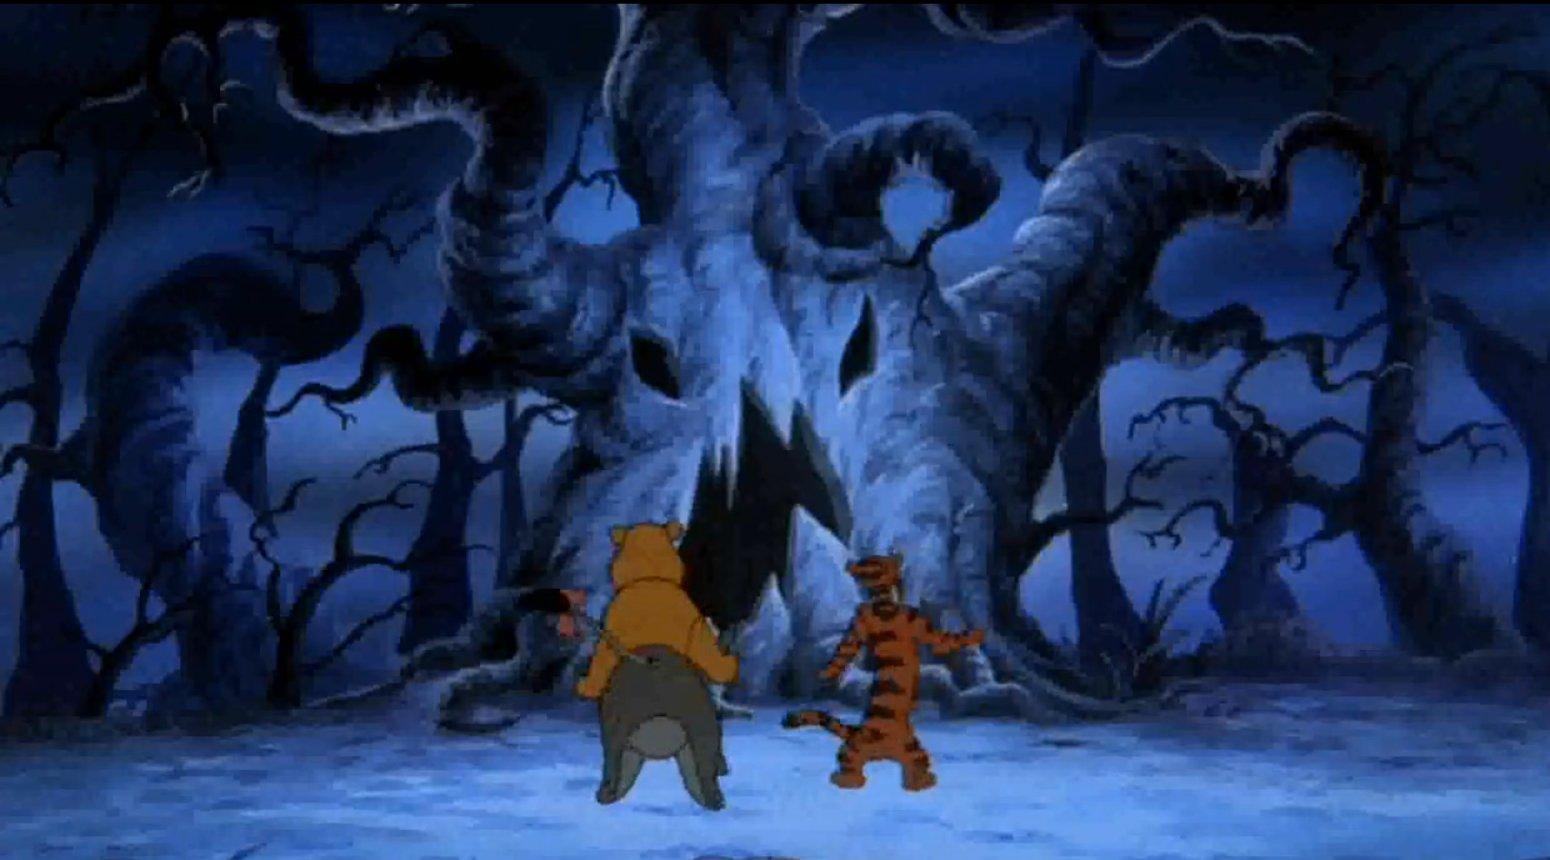 talk about it - Winnie The Pooh Heffalump Halloween